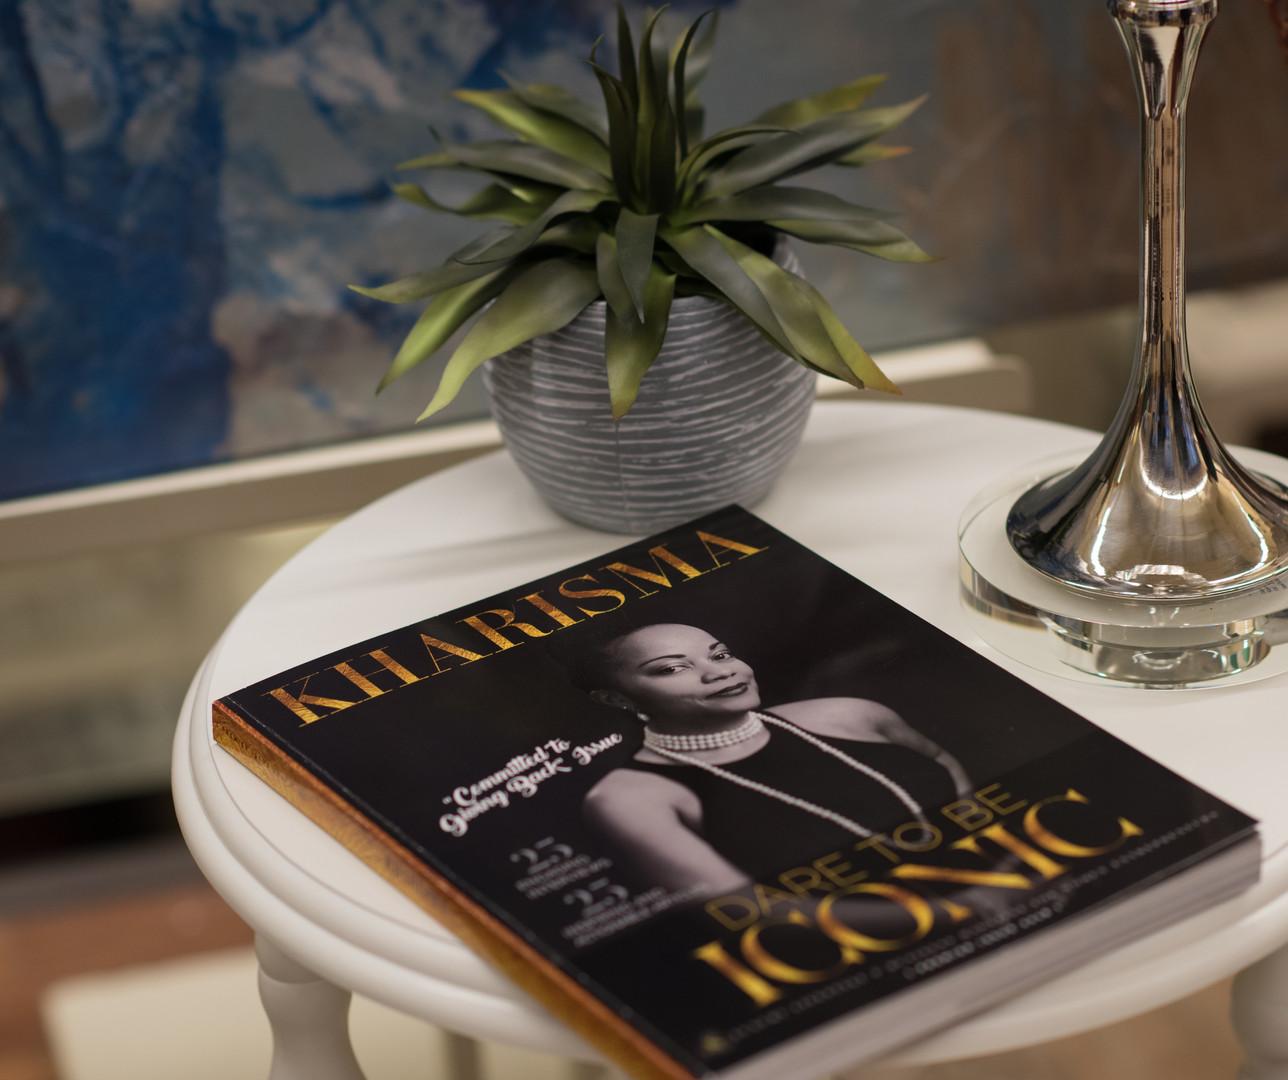 Kharisma Magazine on table - Copy.jpg